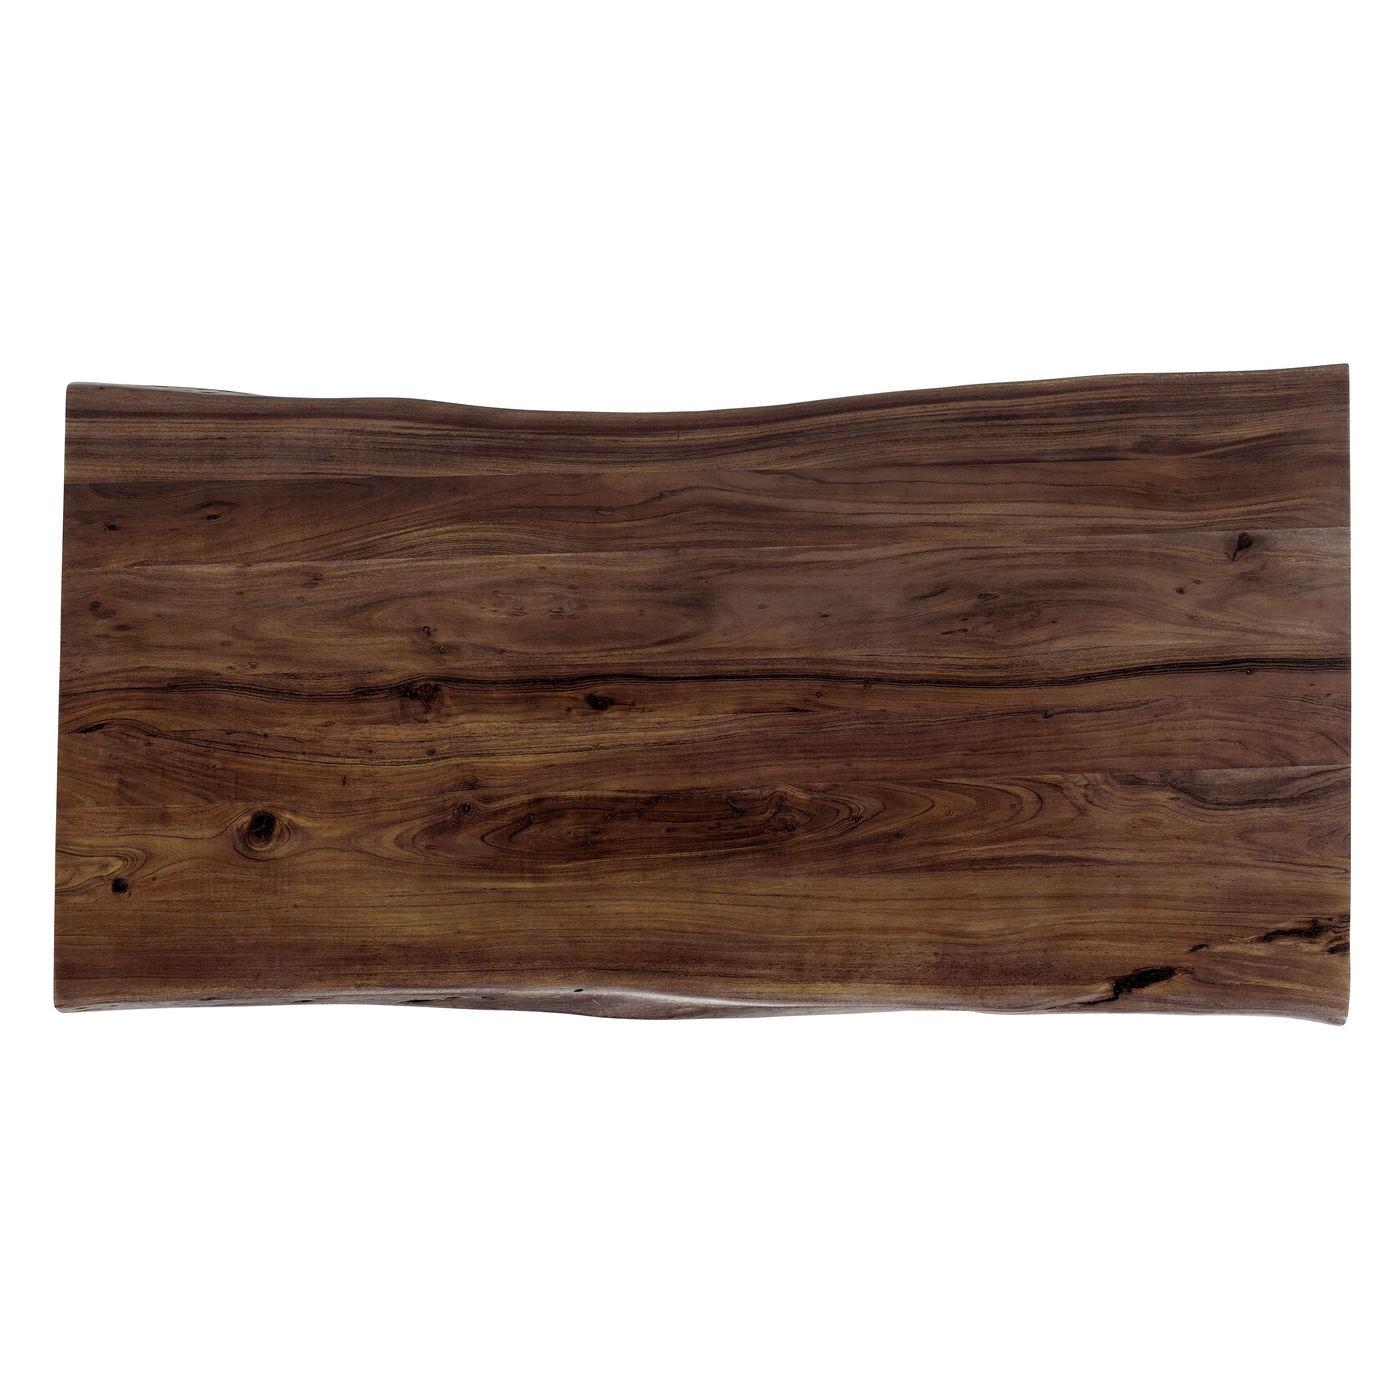 Table Harmony noyer noire 200x100cm Kare Design